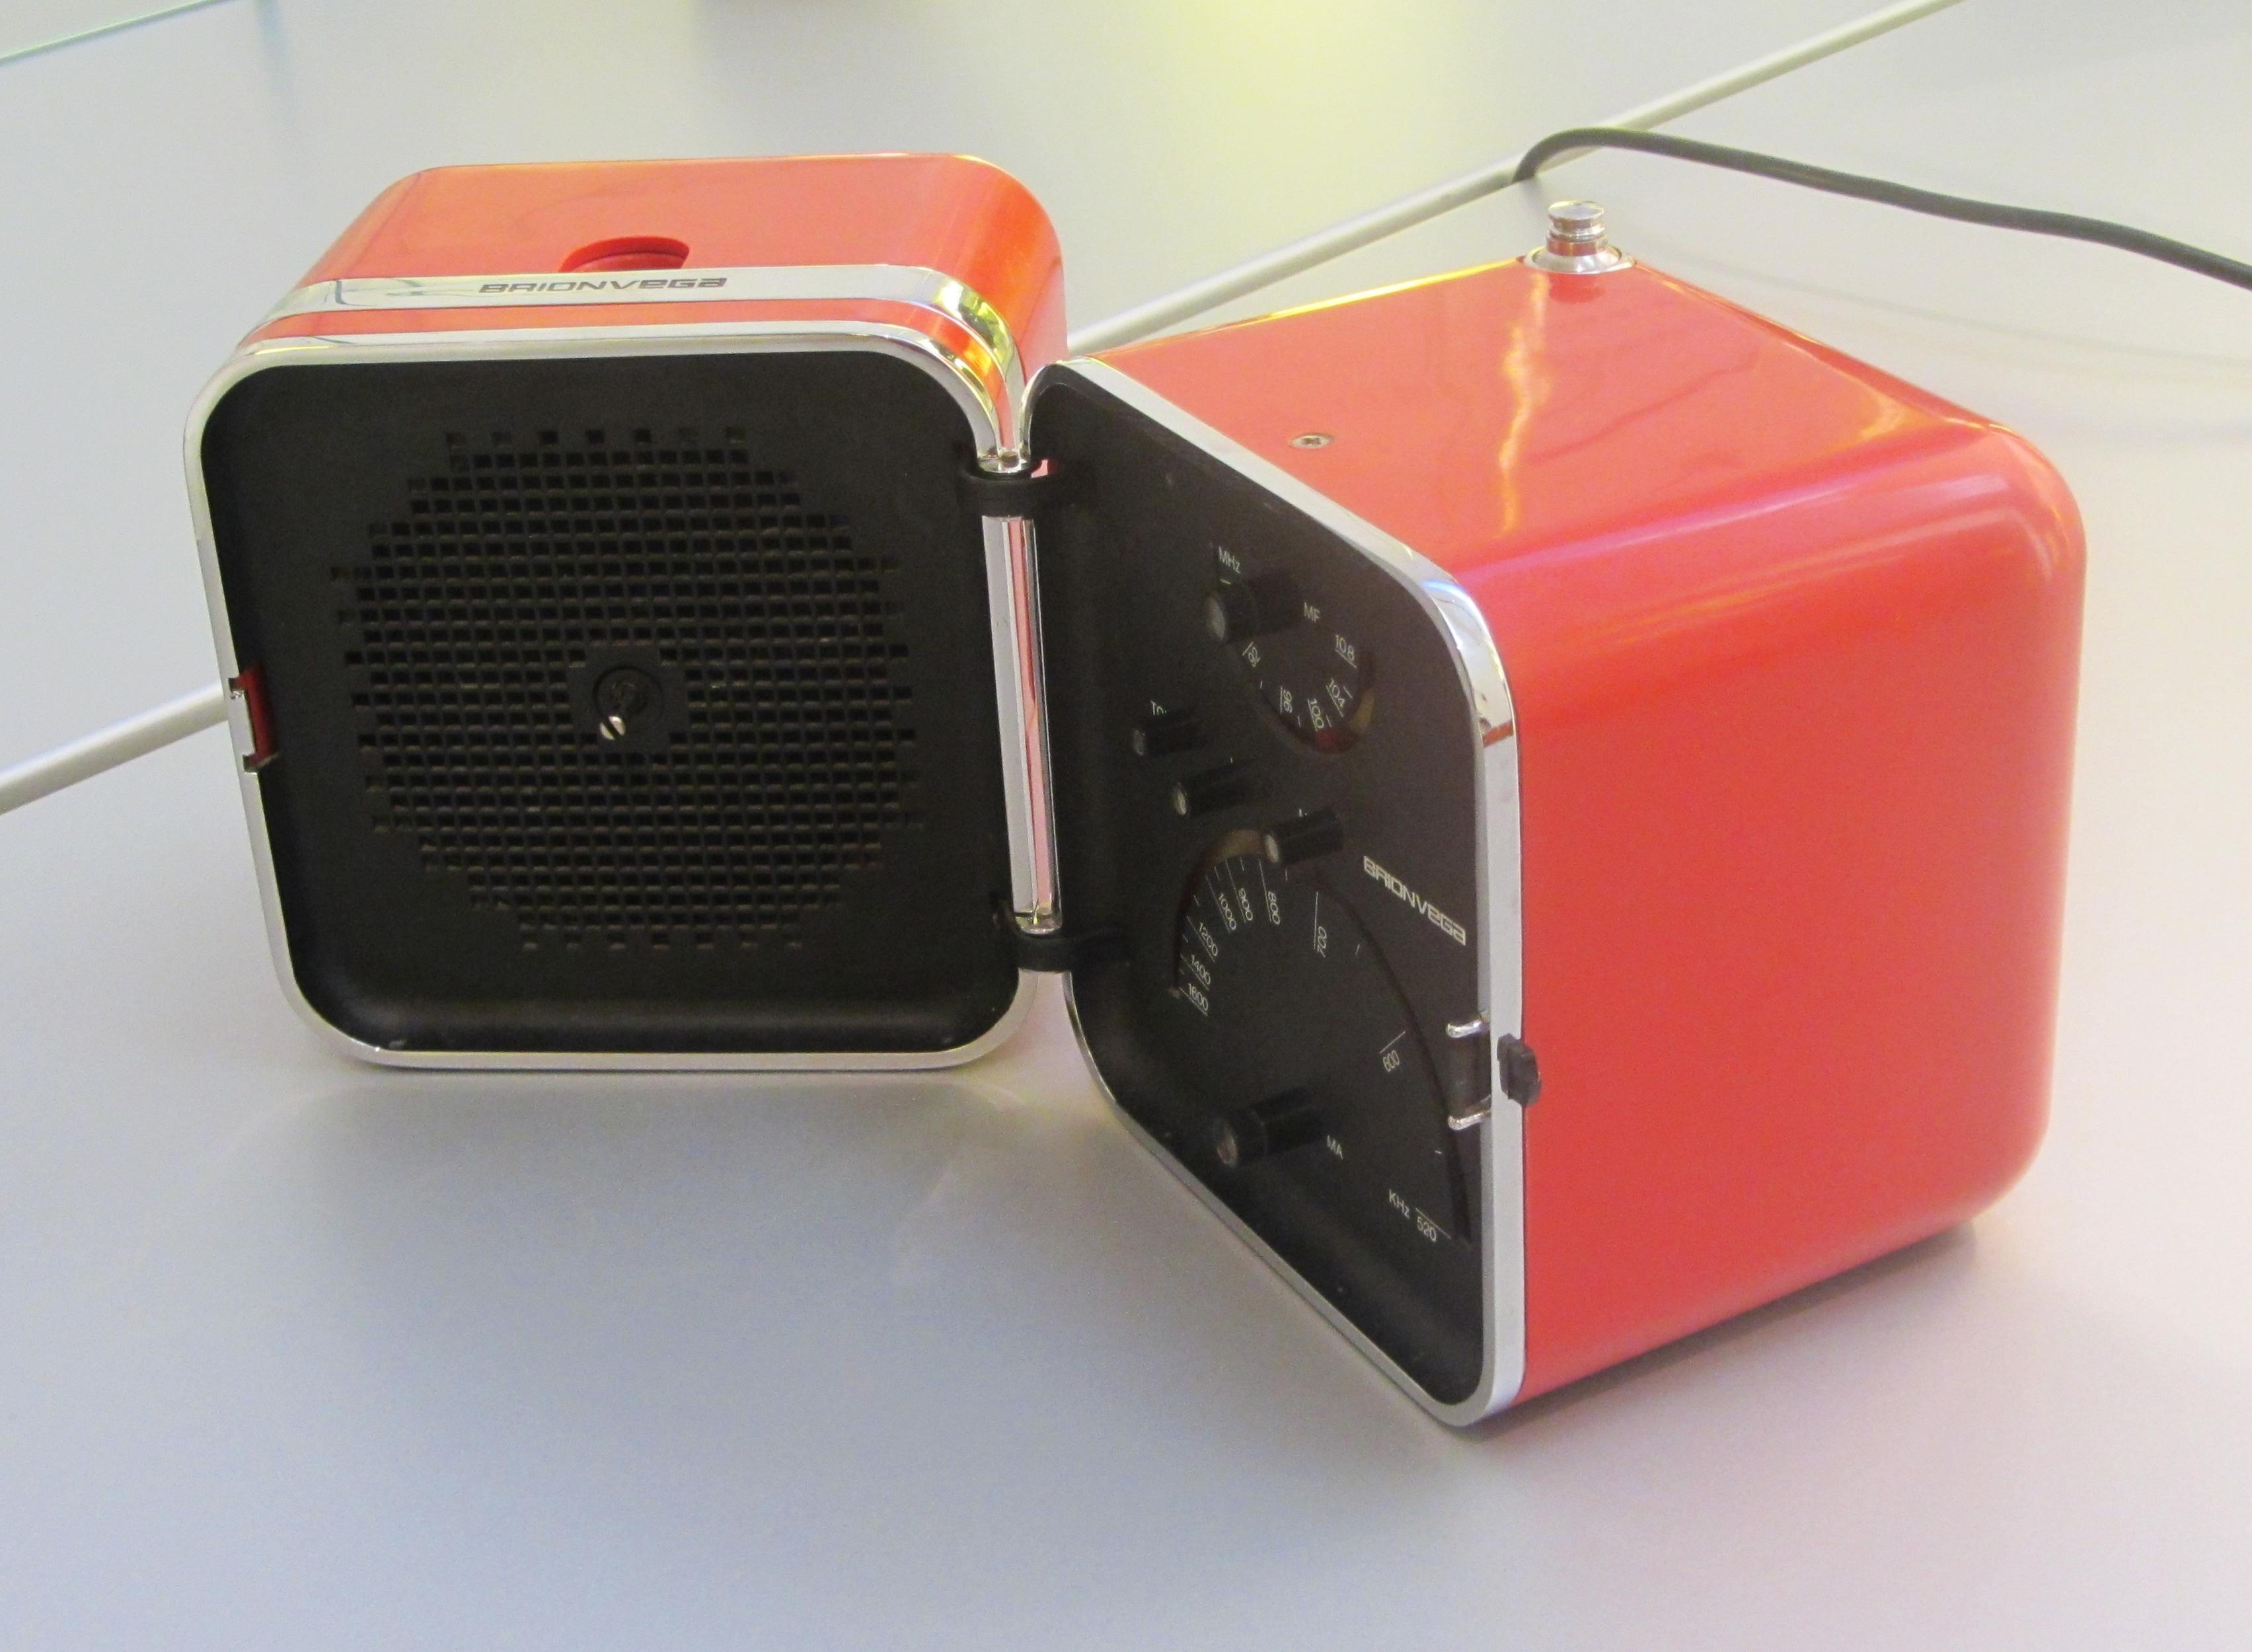 file 11 italy domestic radio receiver design of italy ts 502 marzo zanuso and. Black Bedroom Furniture Sets. Home Design Ideas